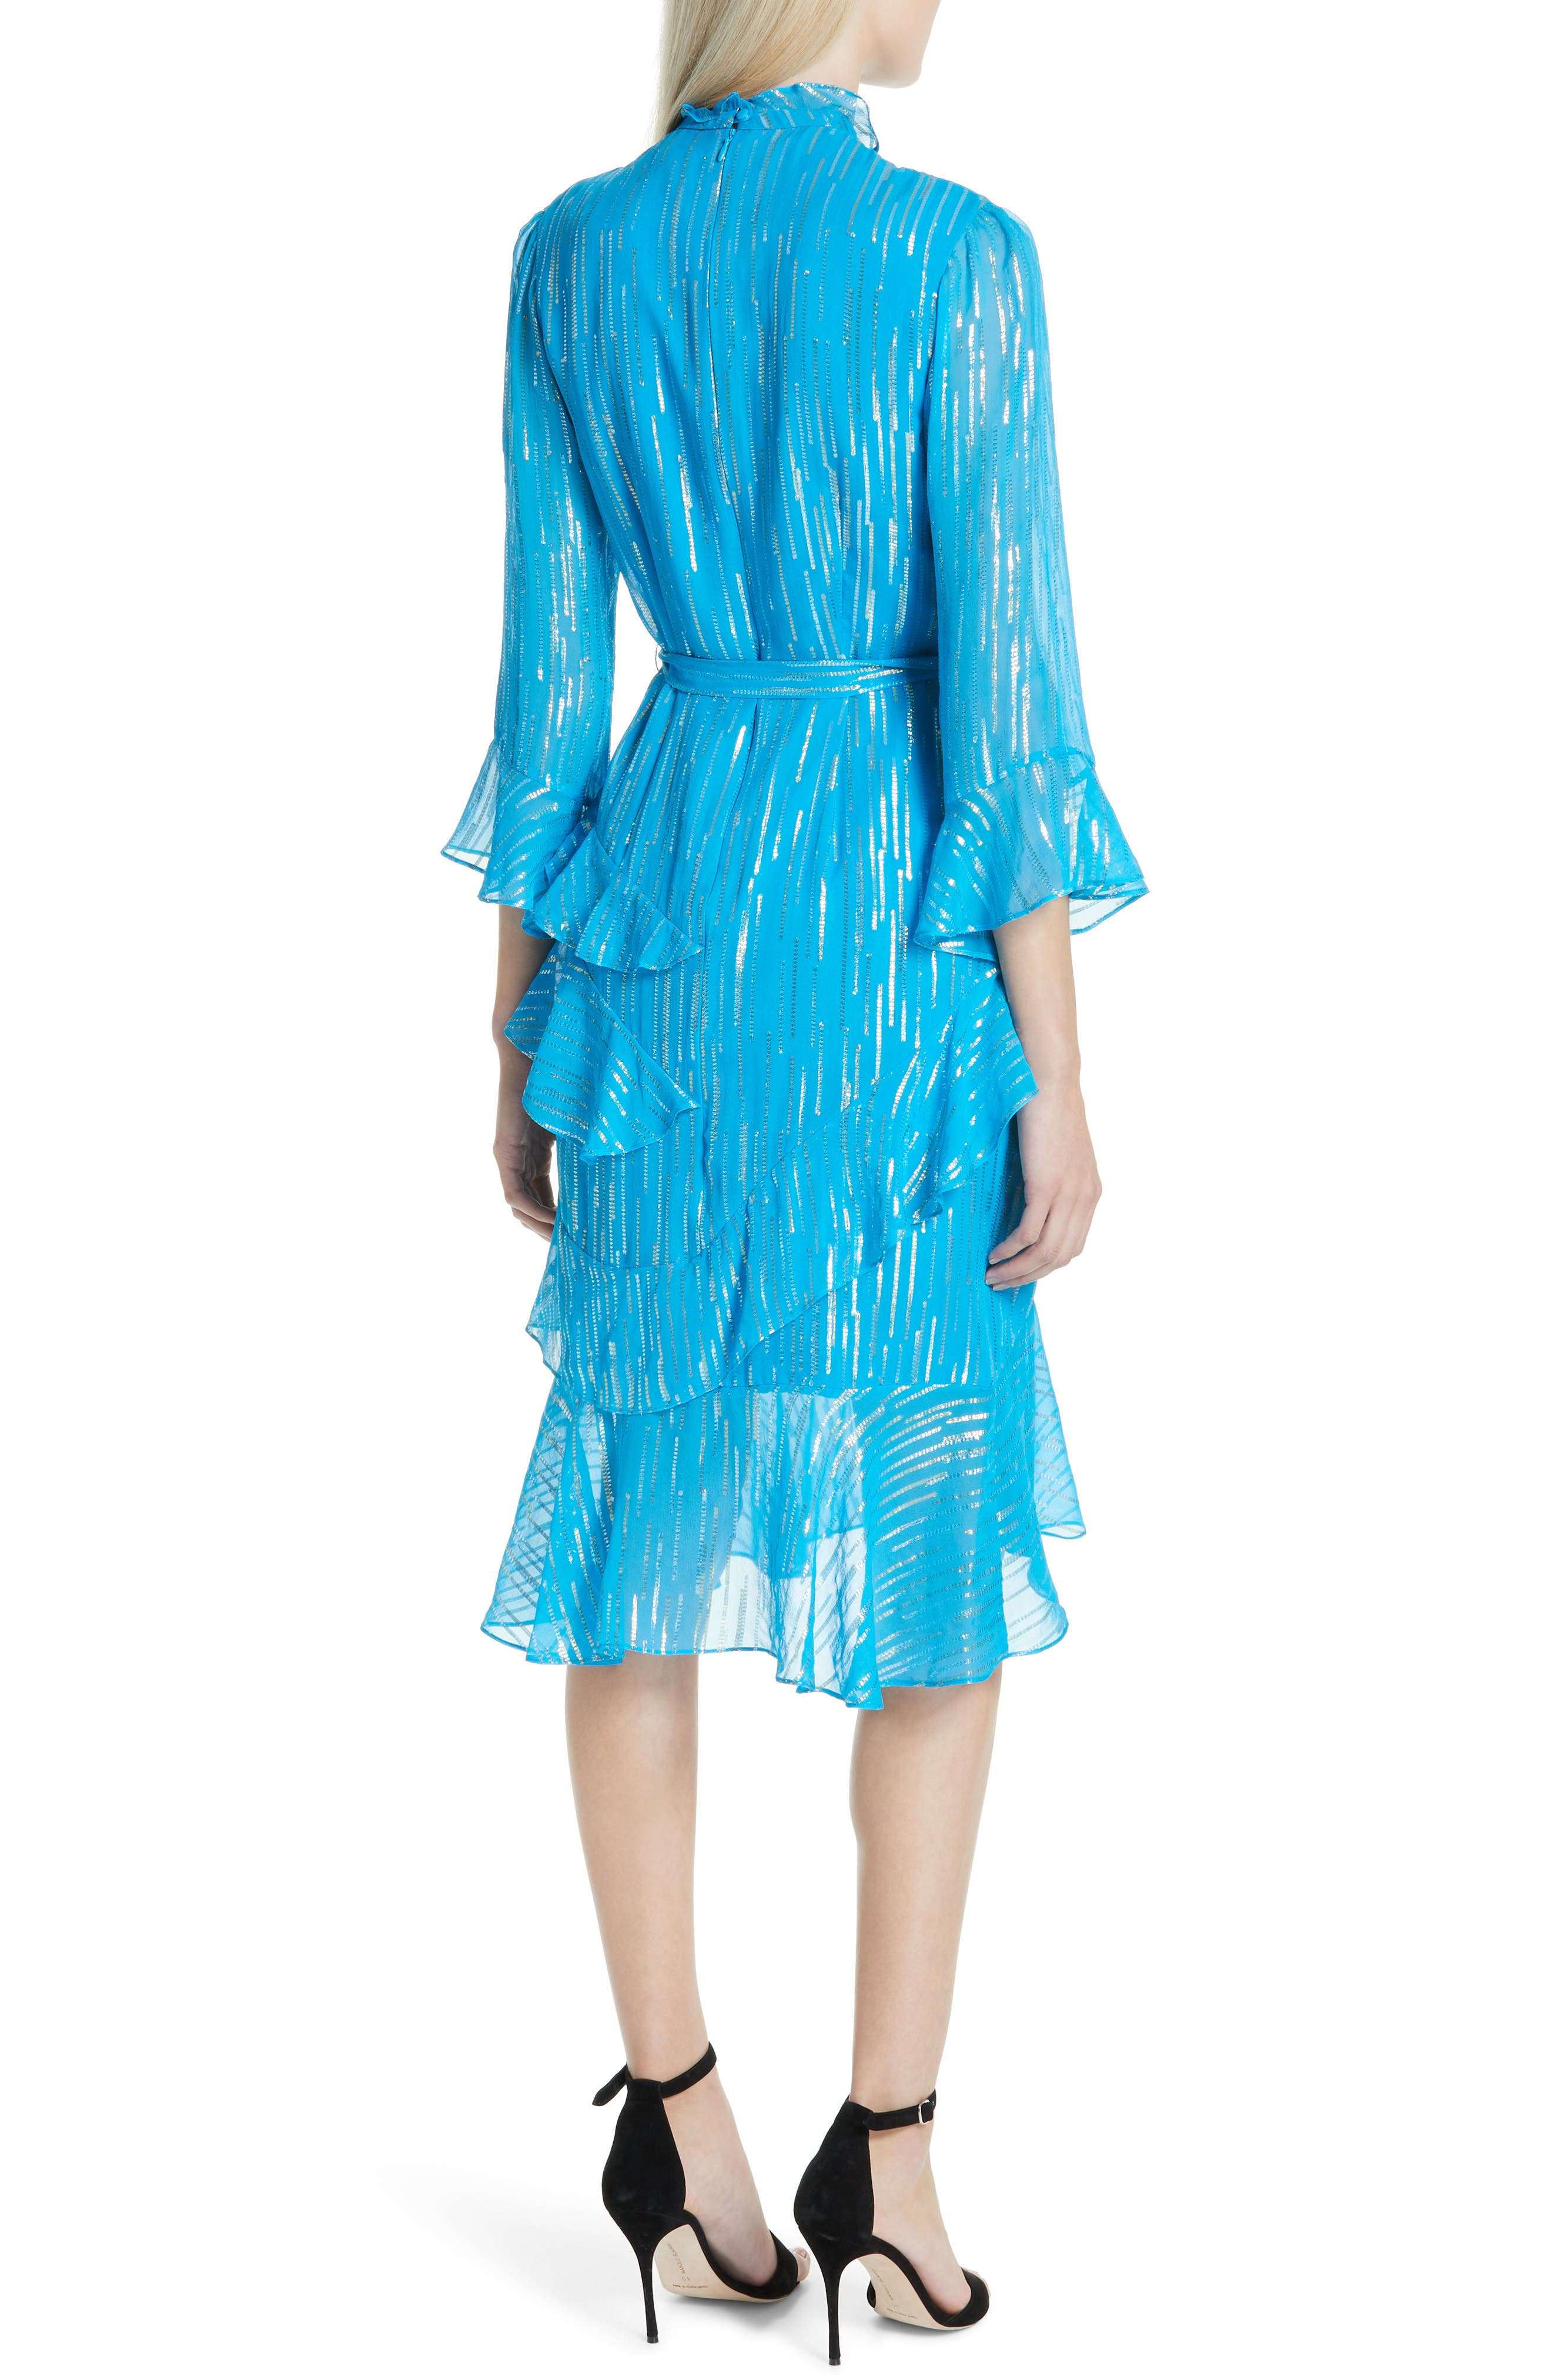 SALONI, Marissa Metallic Ruffle Dress, Alternate thumbnail 2, color, TURQUOISE/ METALLIC